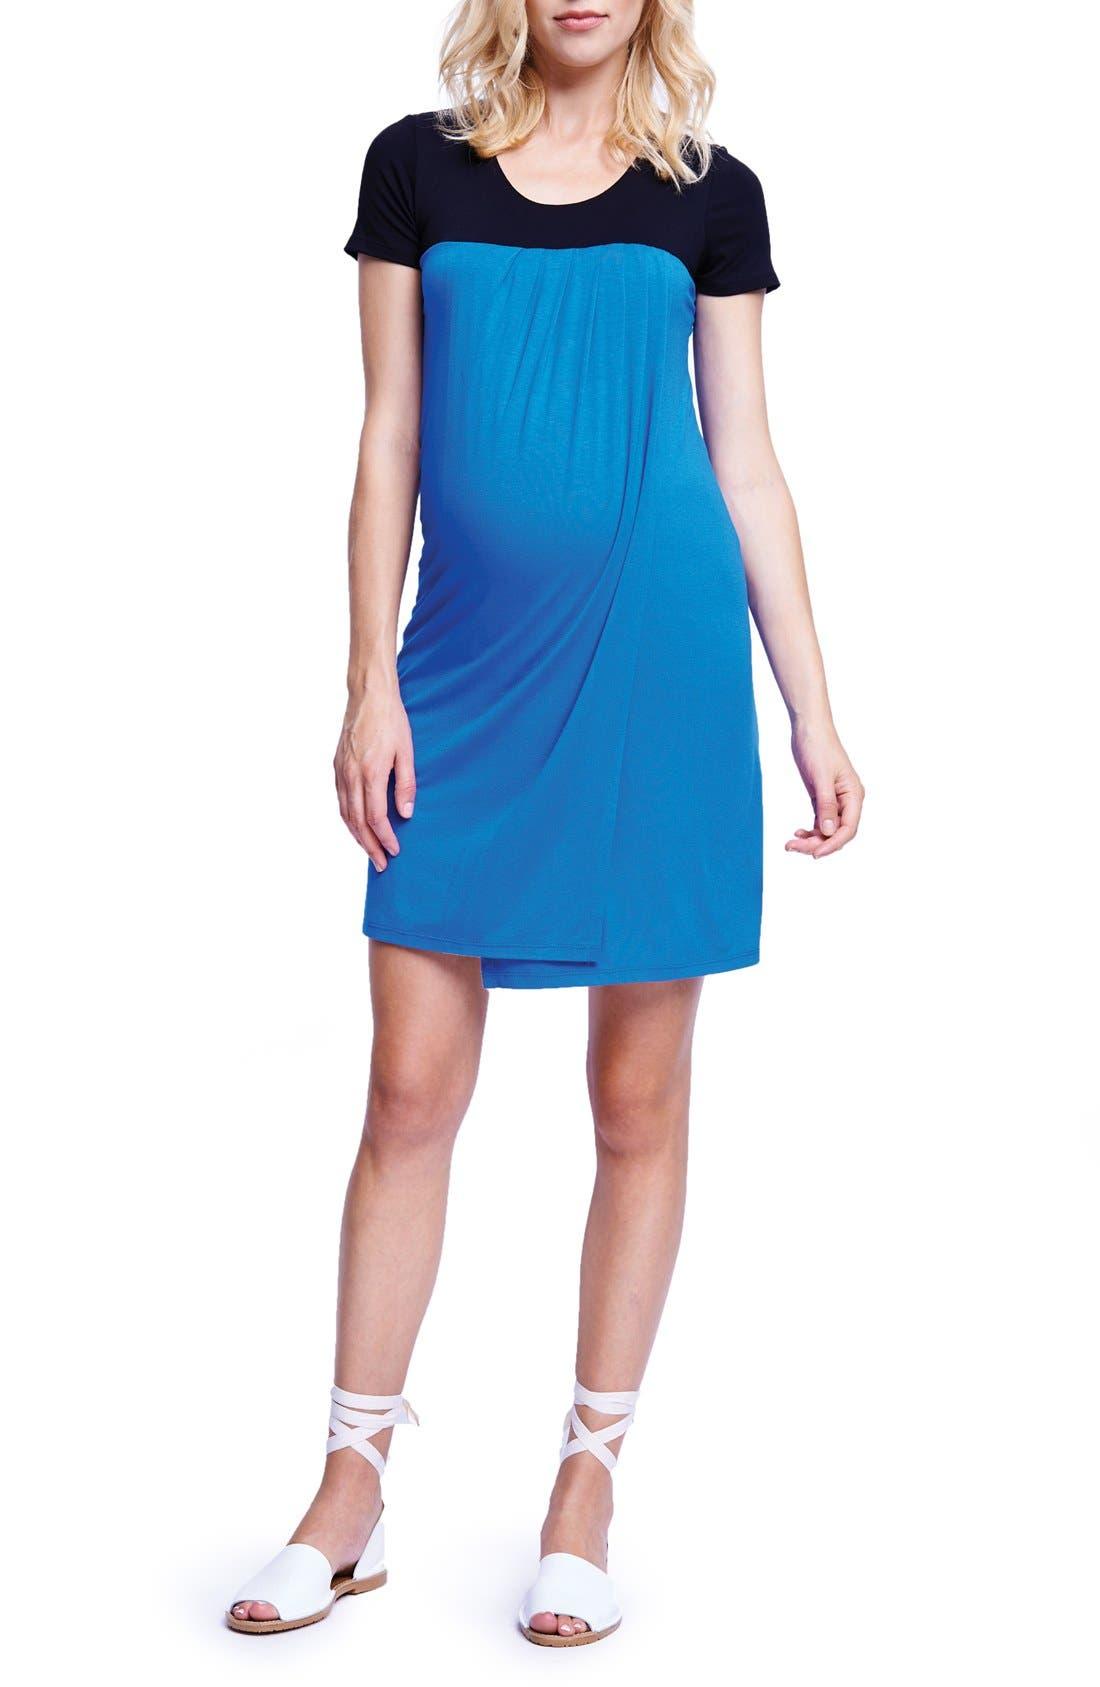 MATERNAL AMERICA,                             Babydoll Maternity/Nursing Dress,                             Main thumbnail 1, color,                             BLACK/ ROYAL BLUE